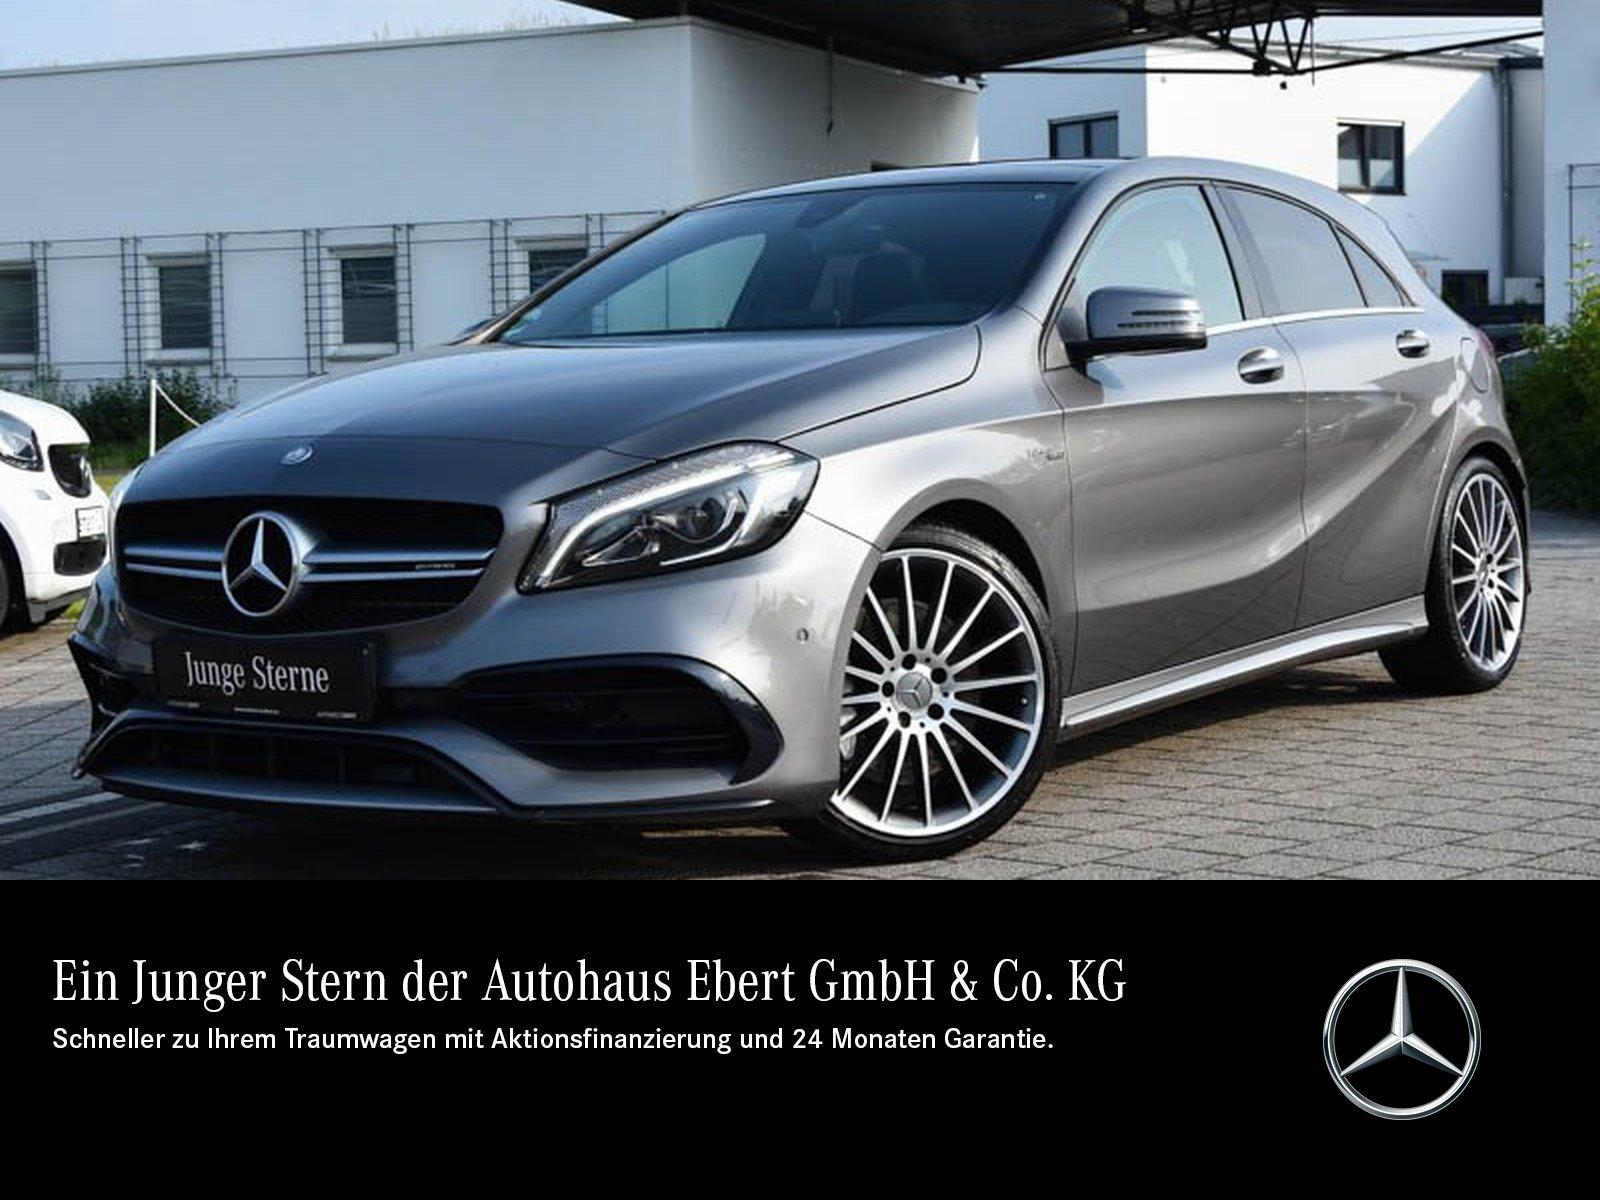 Mercedes-Benz A 45 AMG 4M 7G-DCT+NAVI+RFK+PSD+LED, Jahr 2017, Benzin